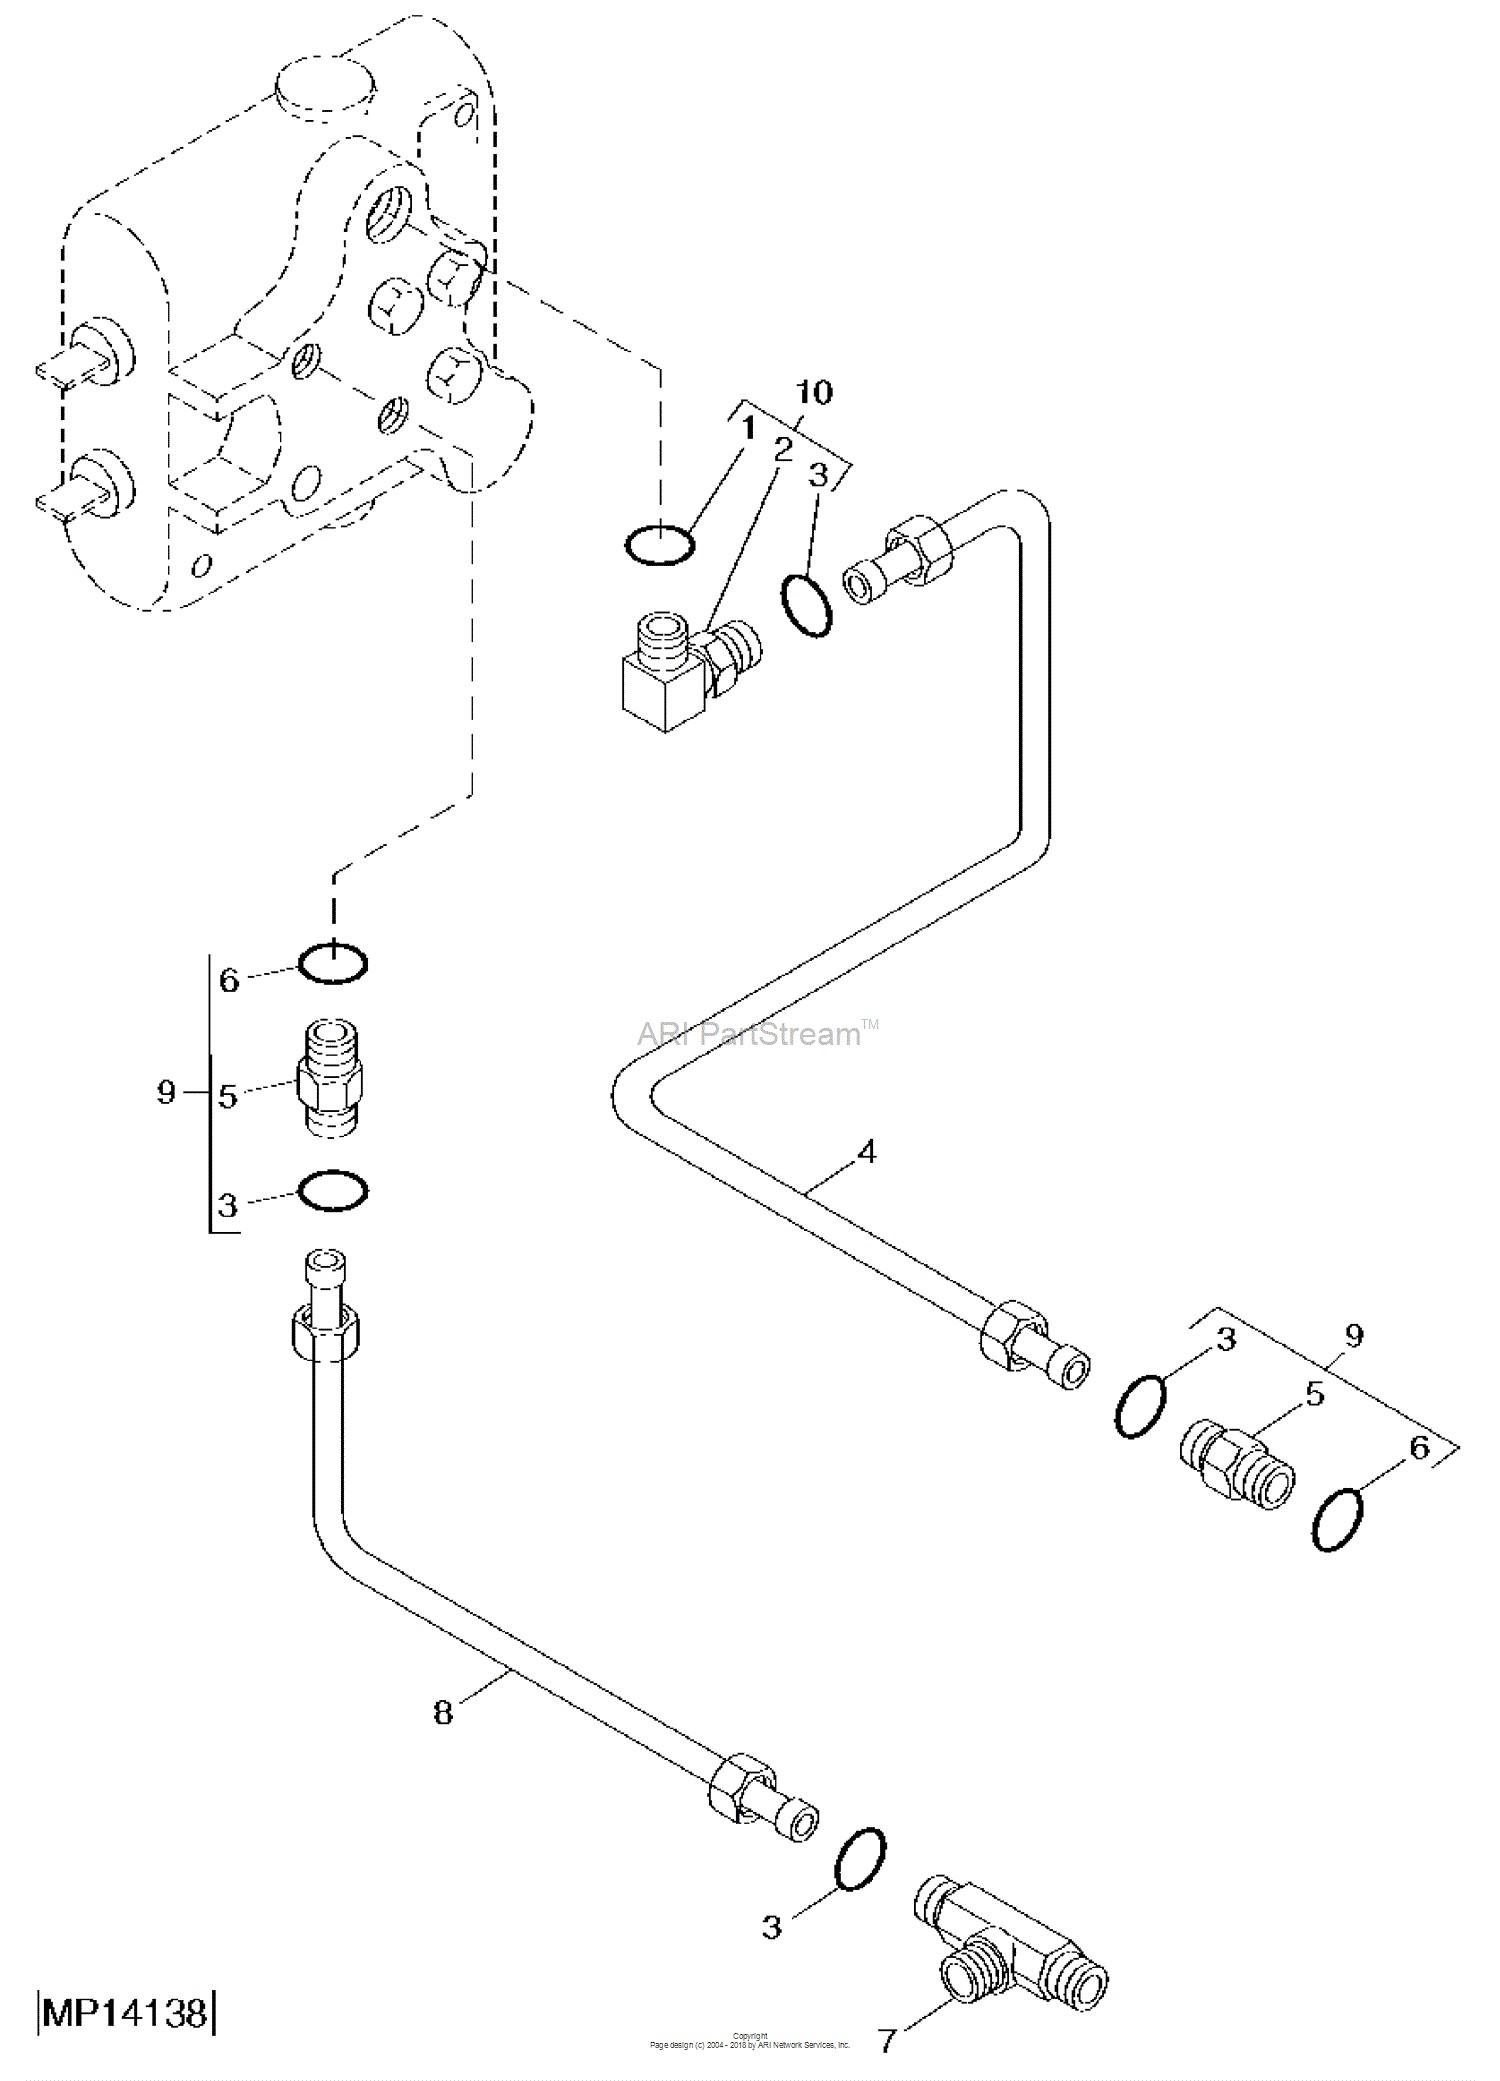 Engine Valve Train Diagram John Deere Parts Diagrams John Deere F1145 Front Mower Pc2350 Of Engine Valve Train Diagram